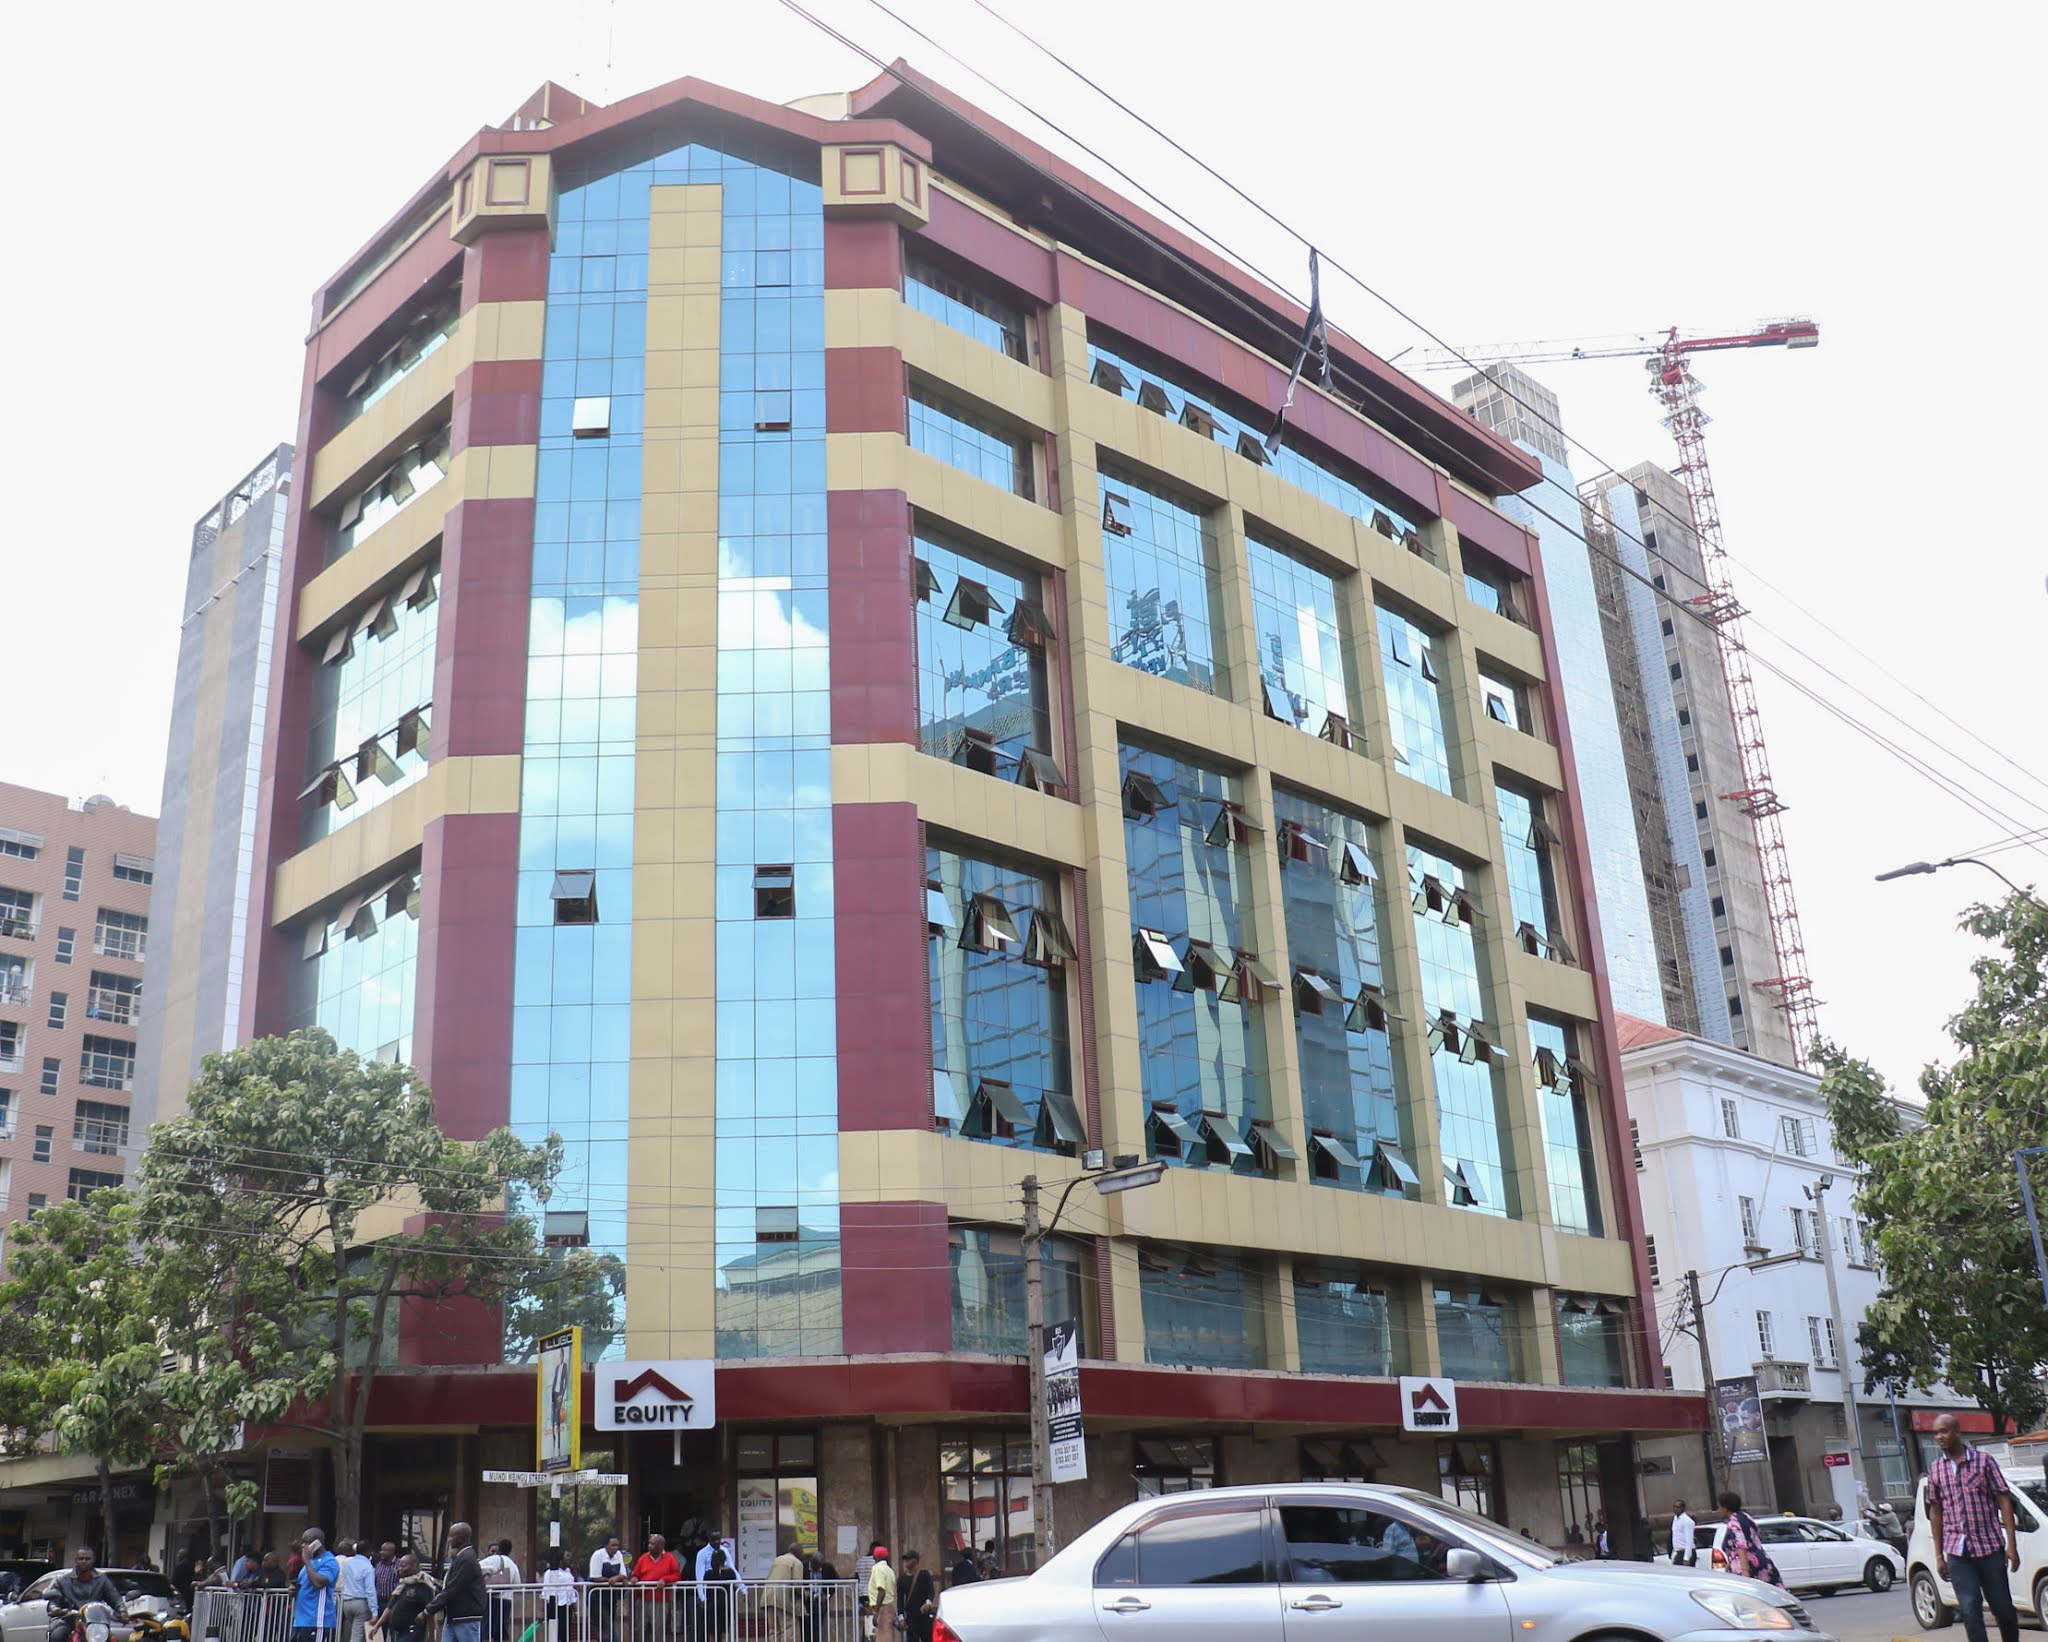 Equity Centre, Nairobi